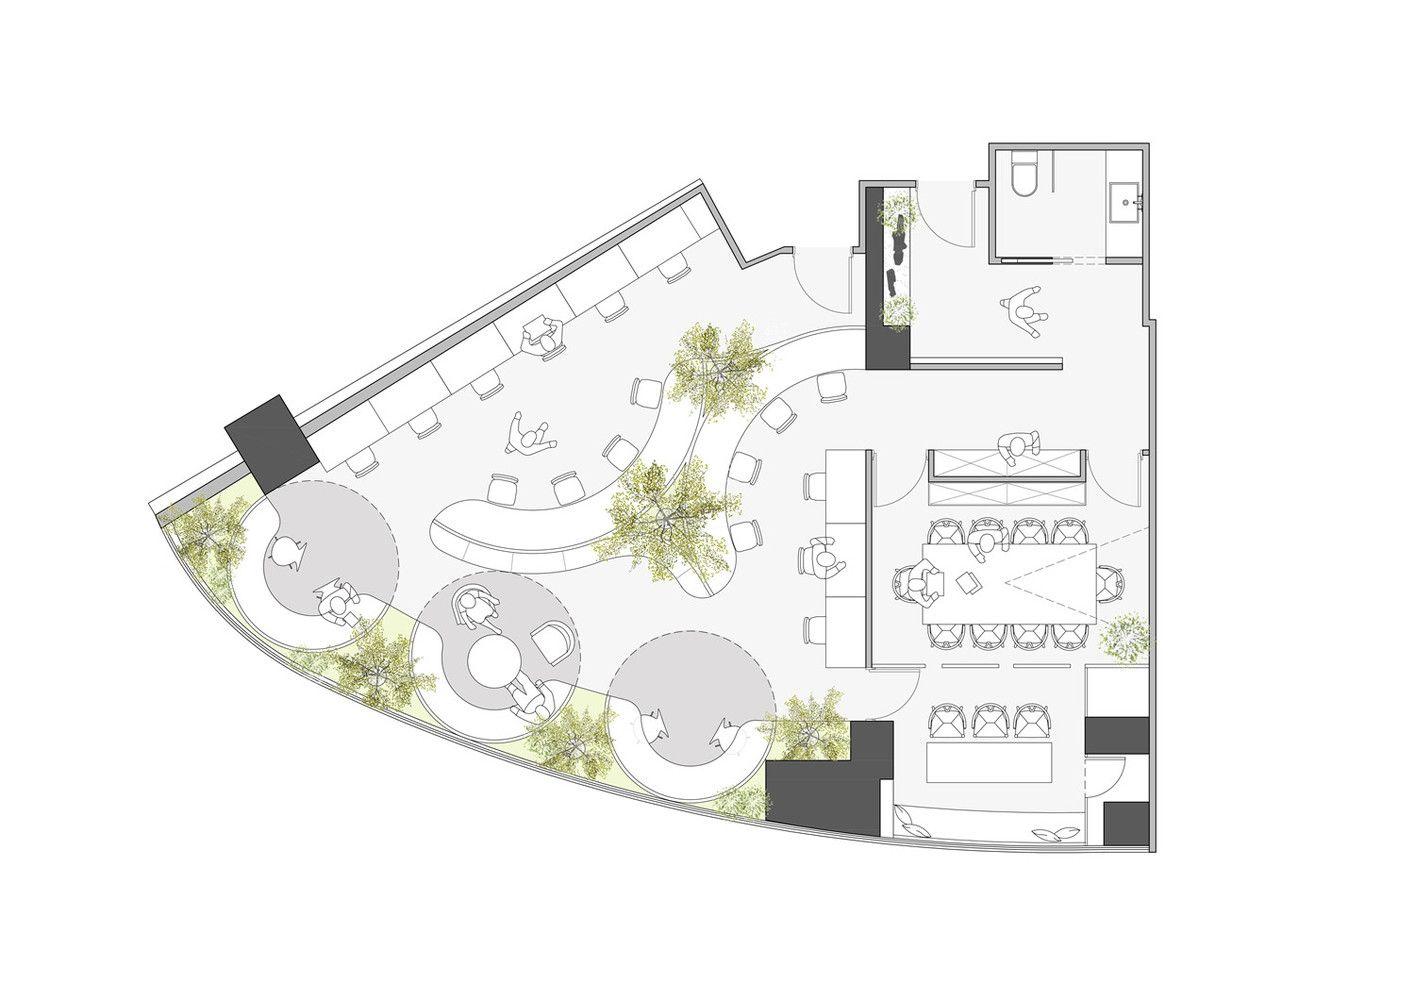 Gallery Of A Hidden Garden Behind The Concrete Walls Muxin